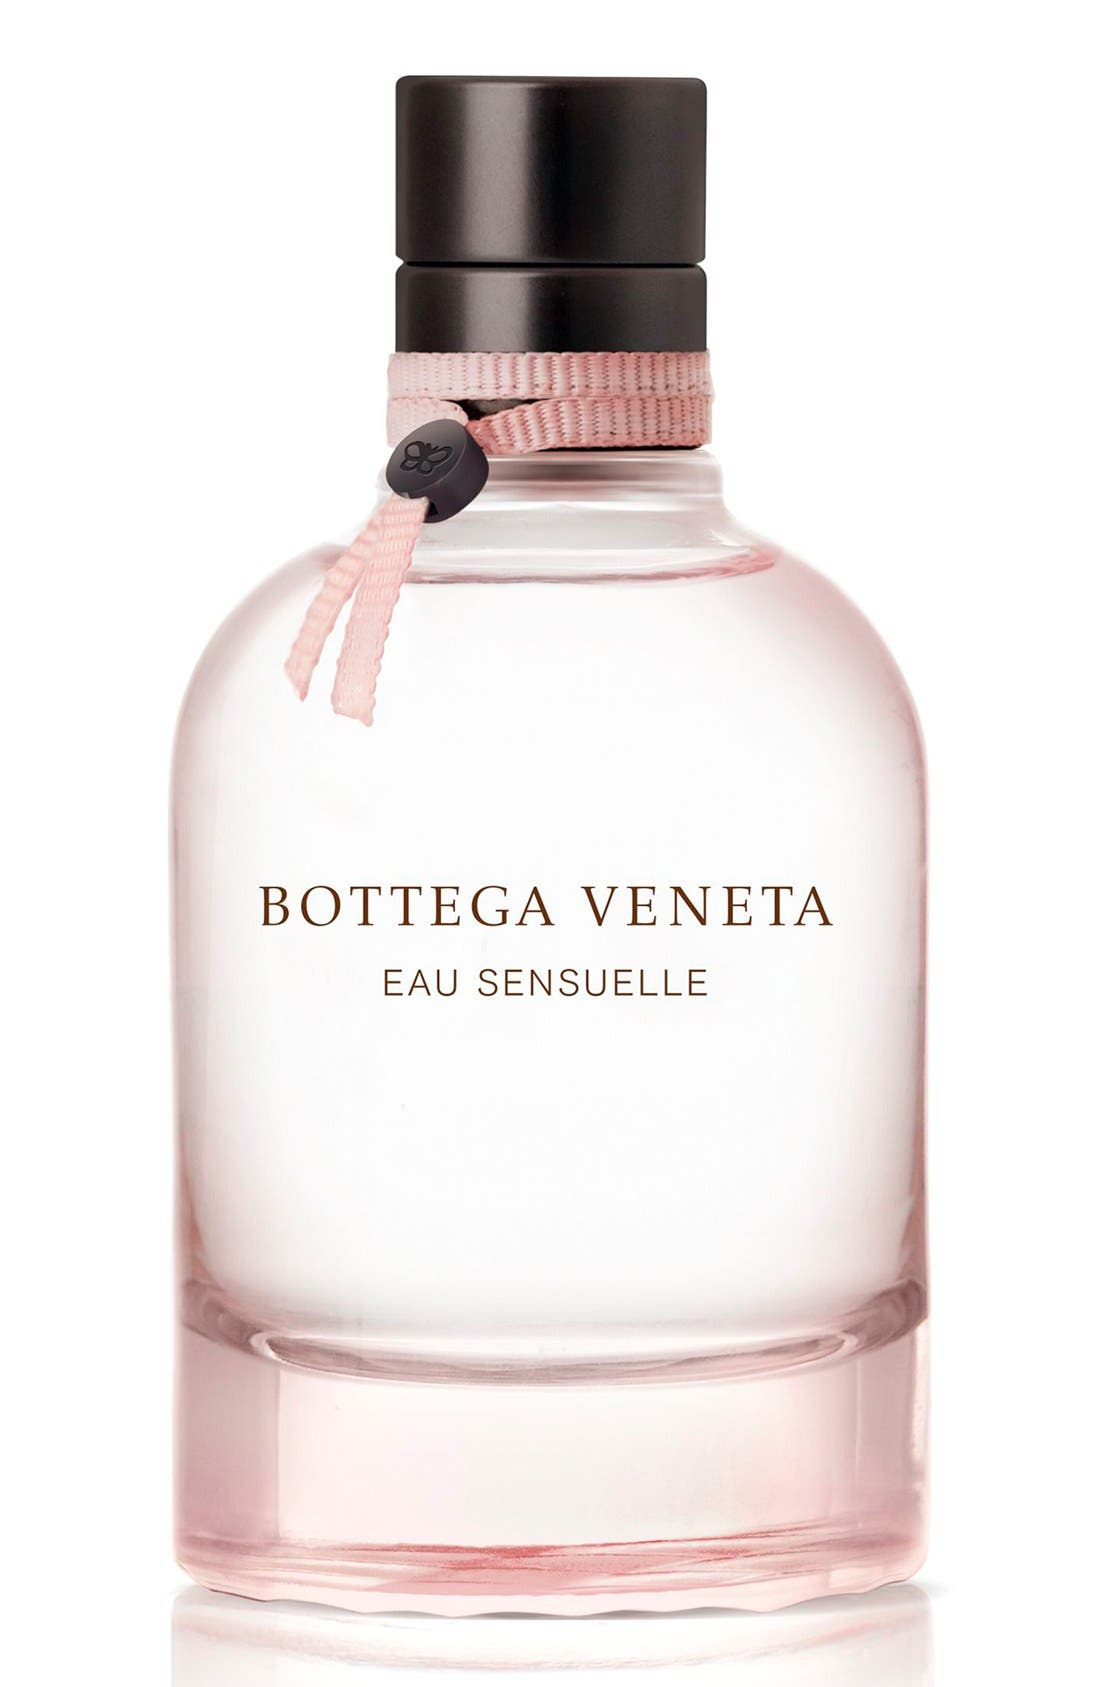 Bottega Veneta 'Eau Sensuelle' Eau de Parfum